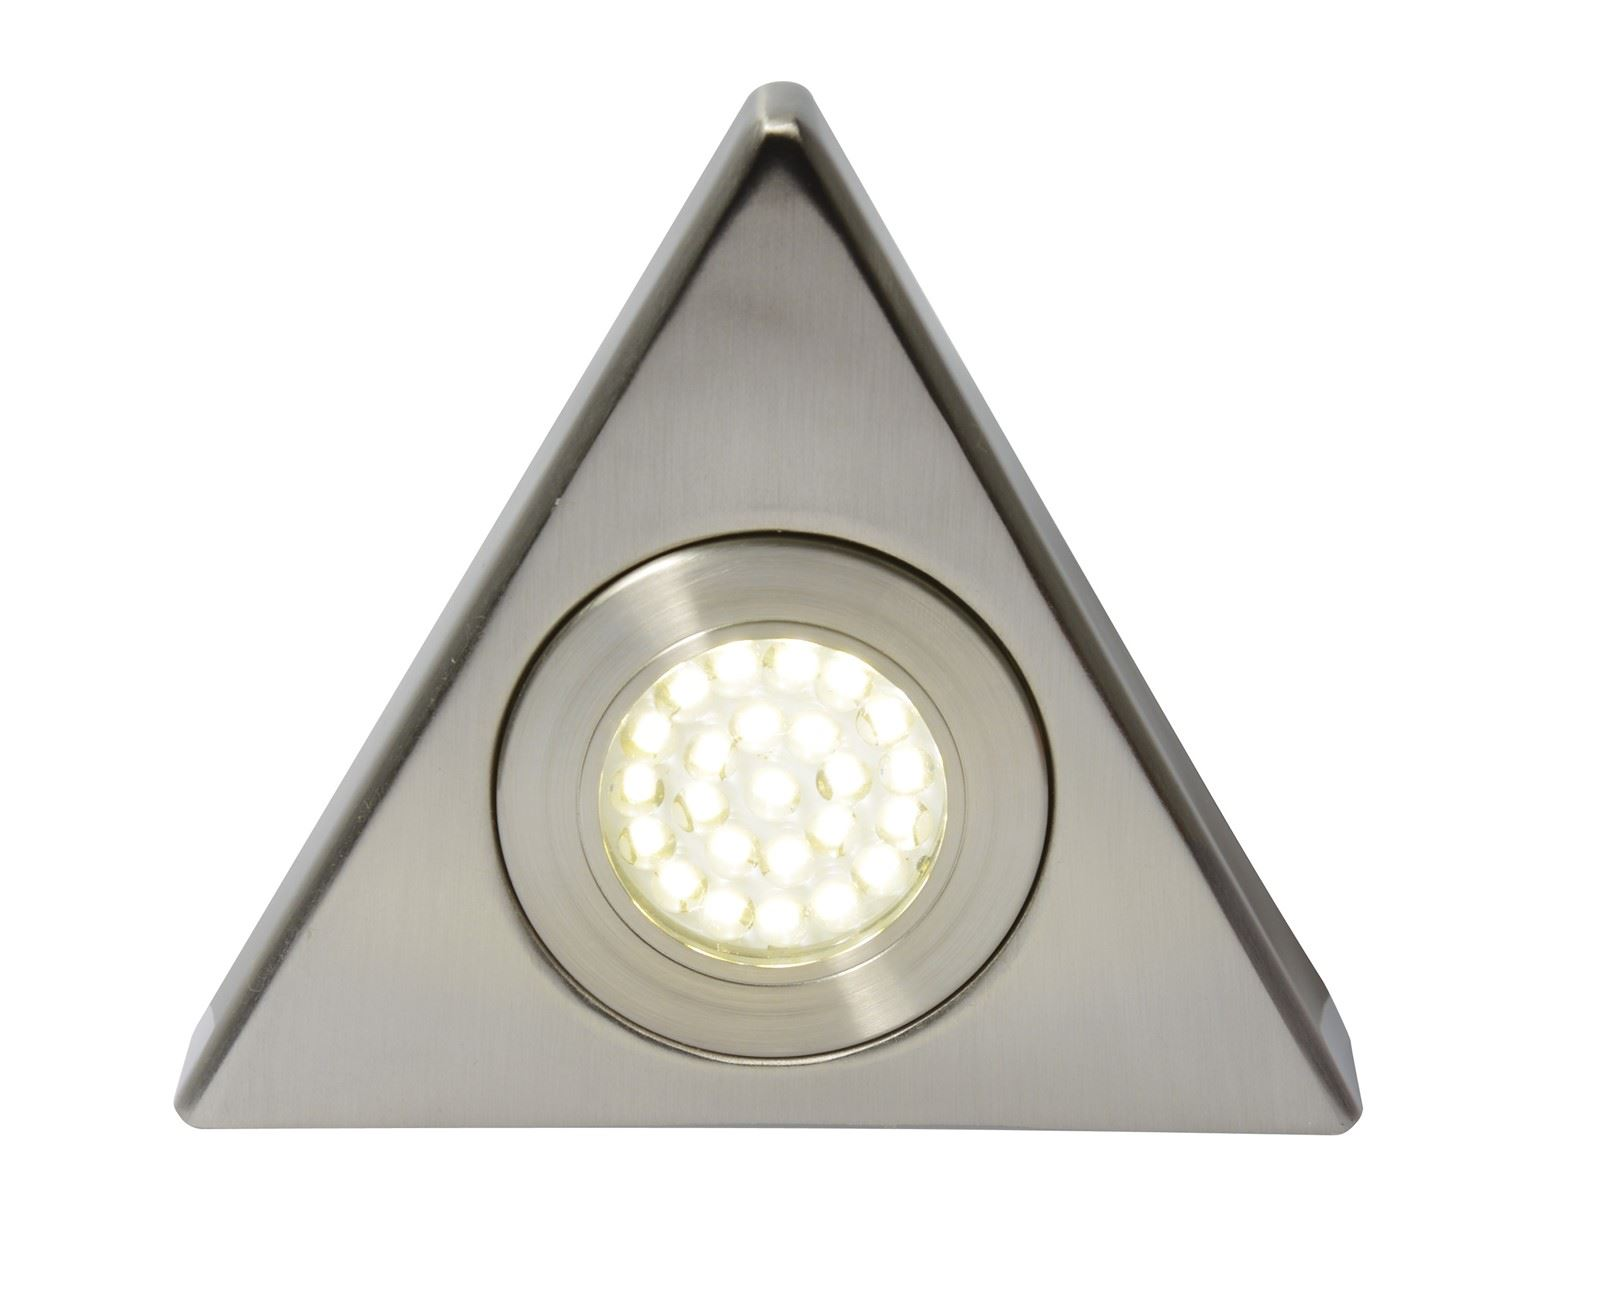 Fonte Led, Mains Voltage, Triangular Cabinet Light, 3000K Warm White